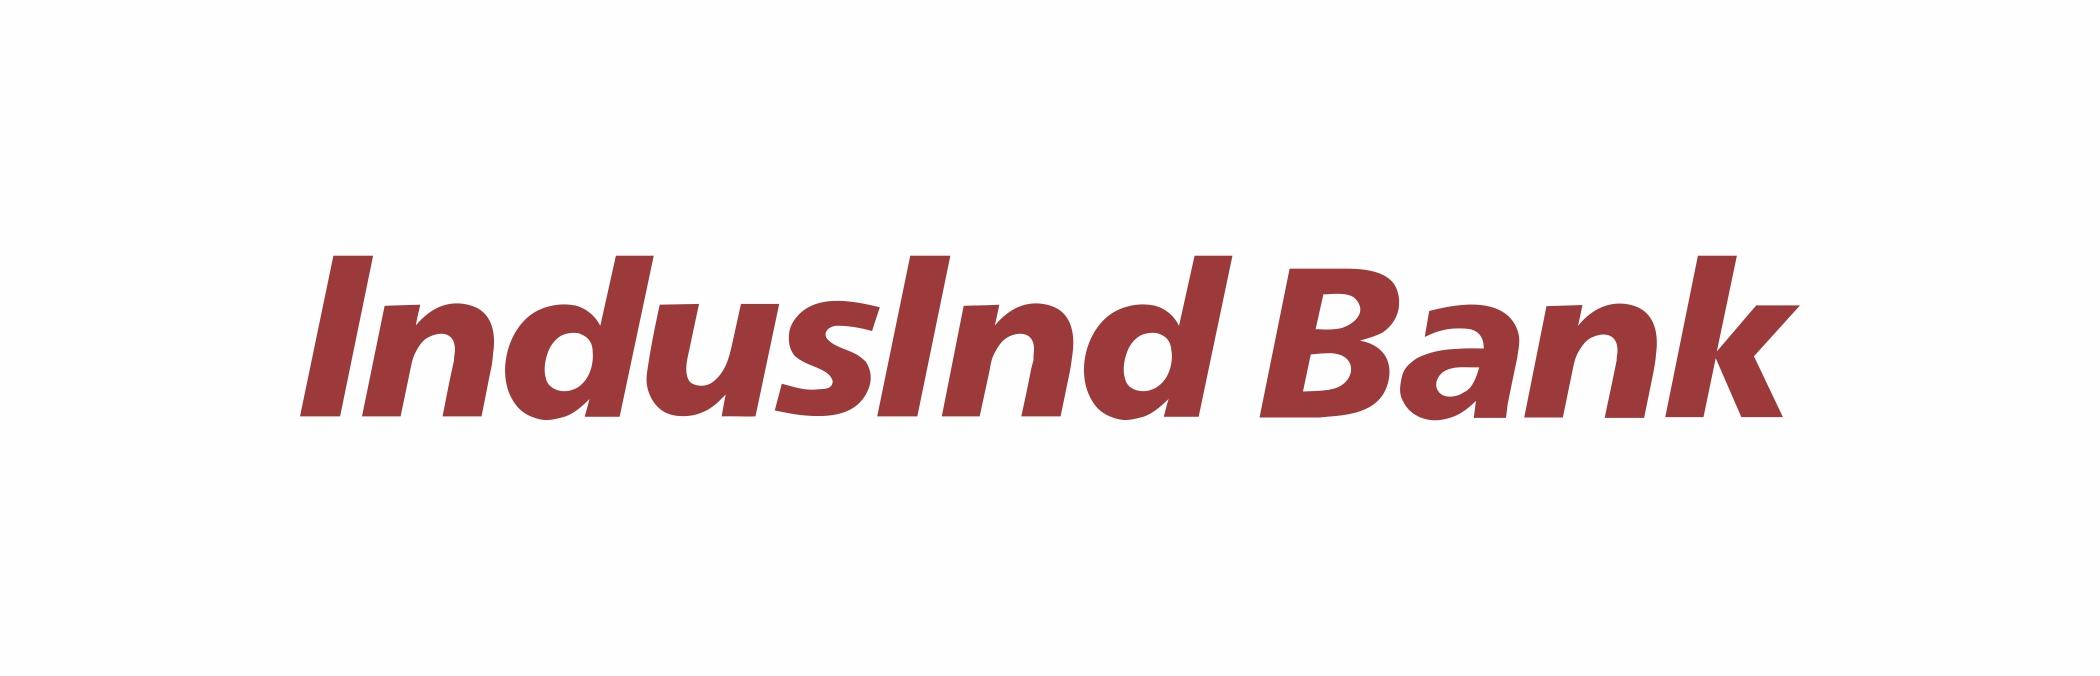 IndusInd Bank,A S RAO NAGAR,SECUNDERABAD